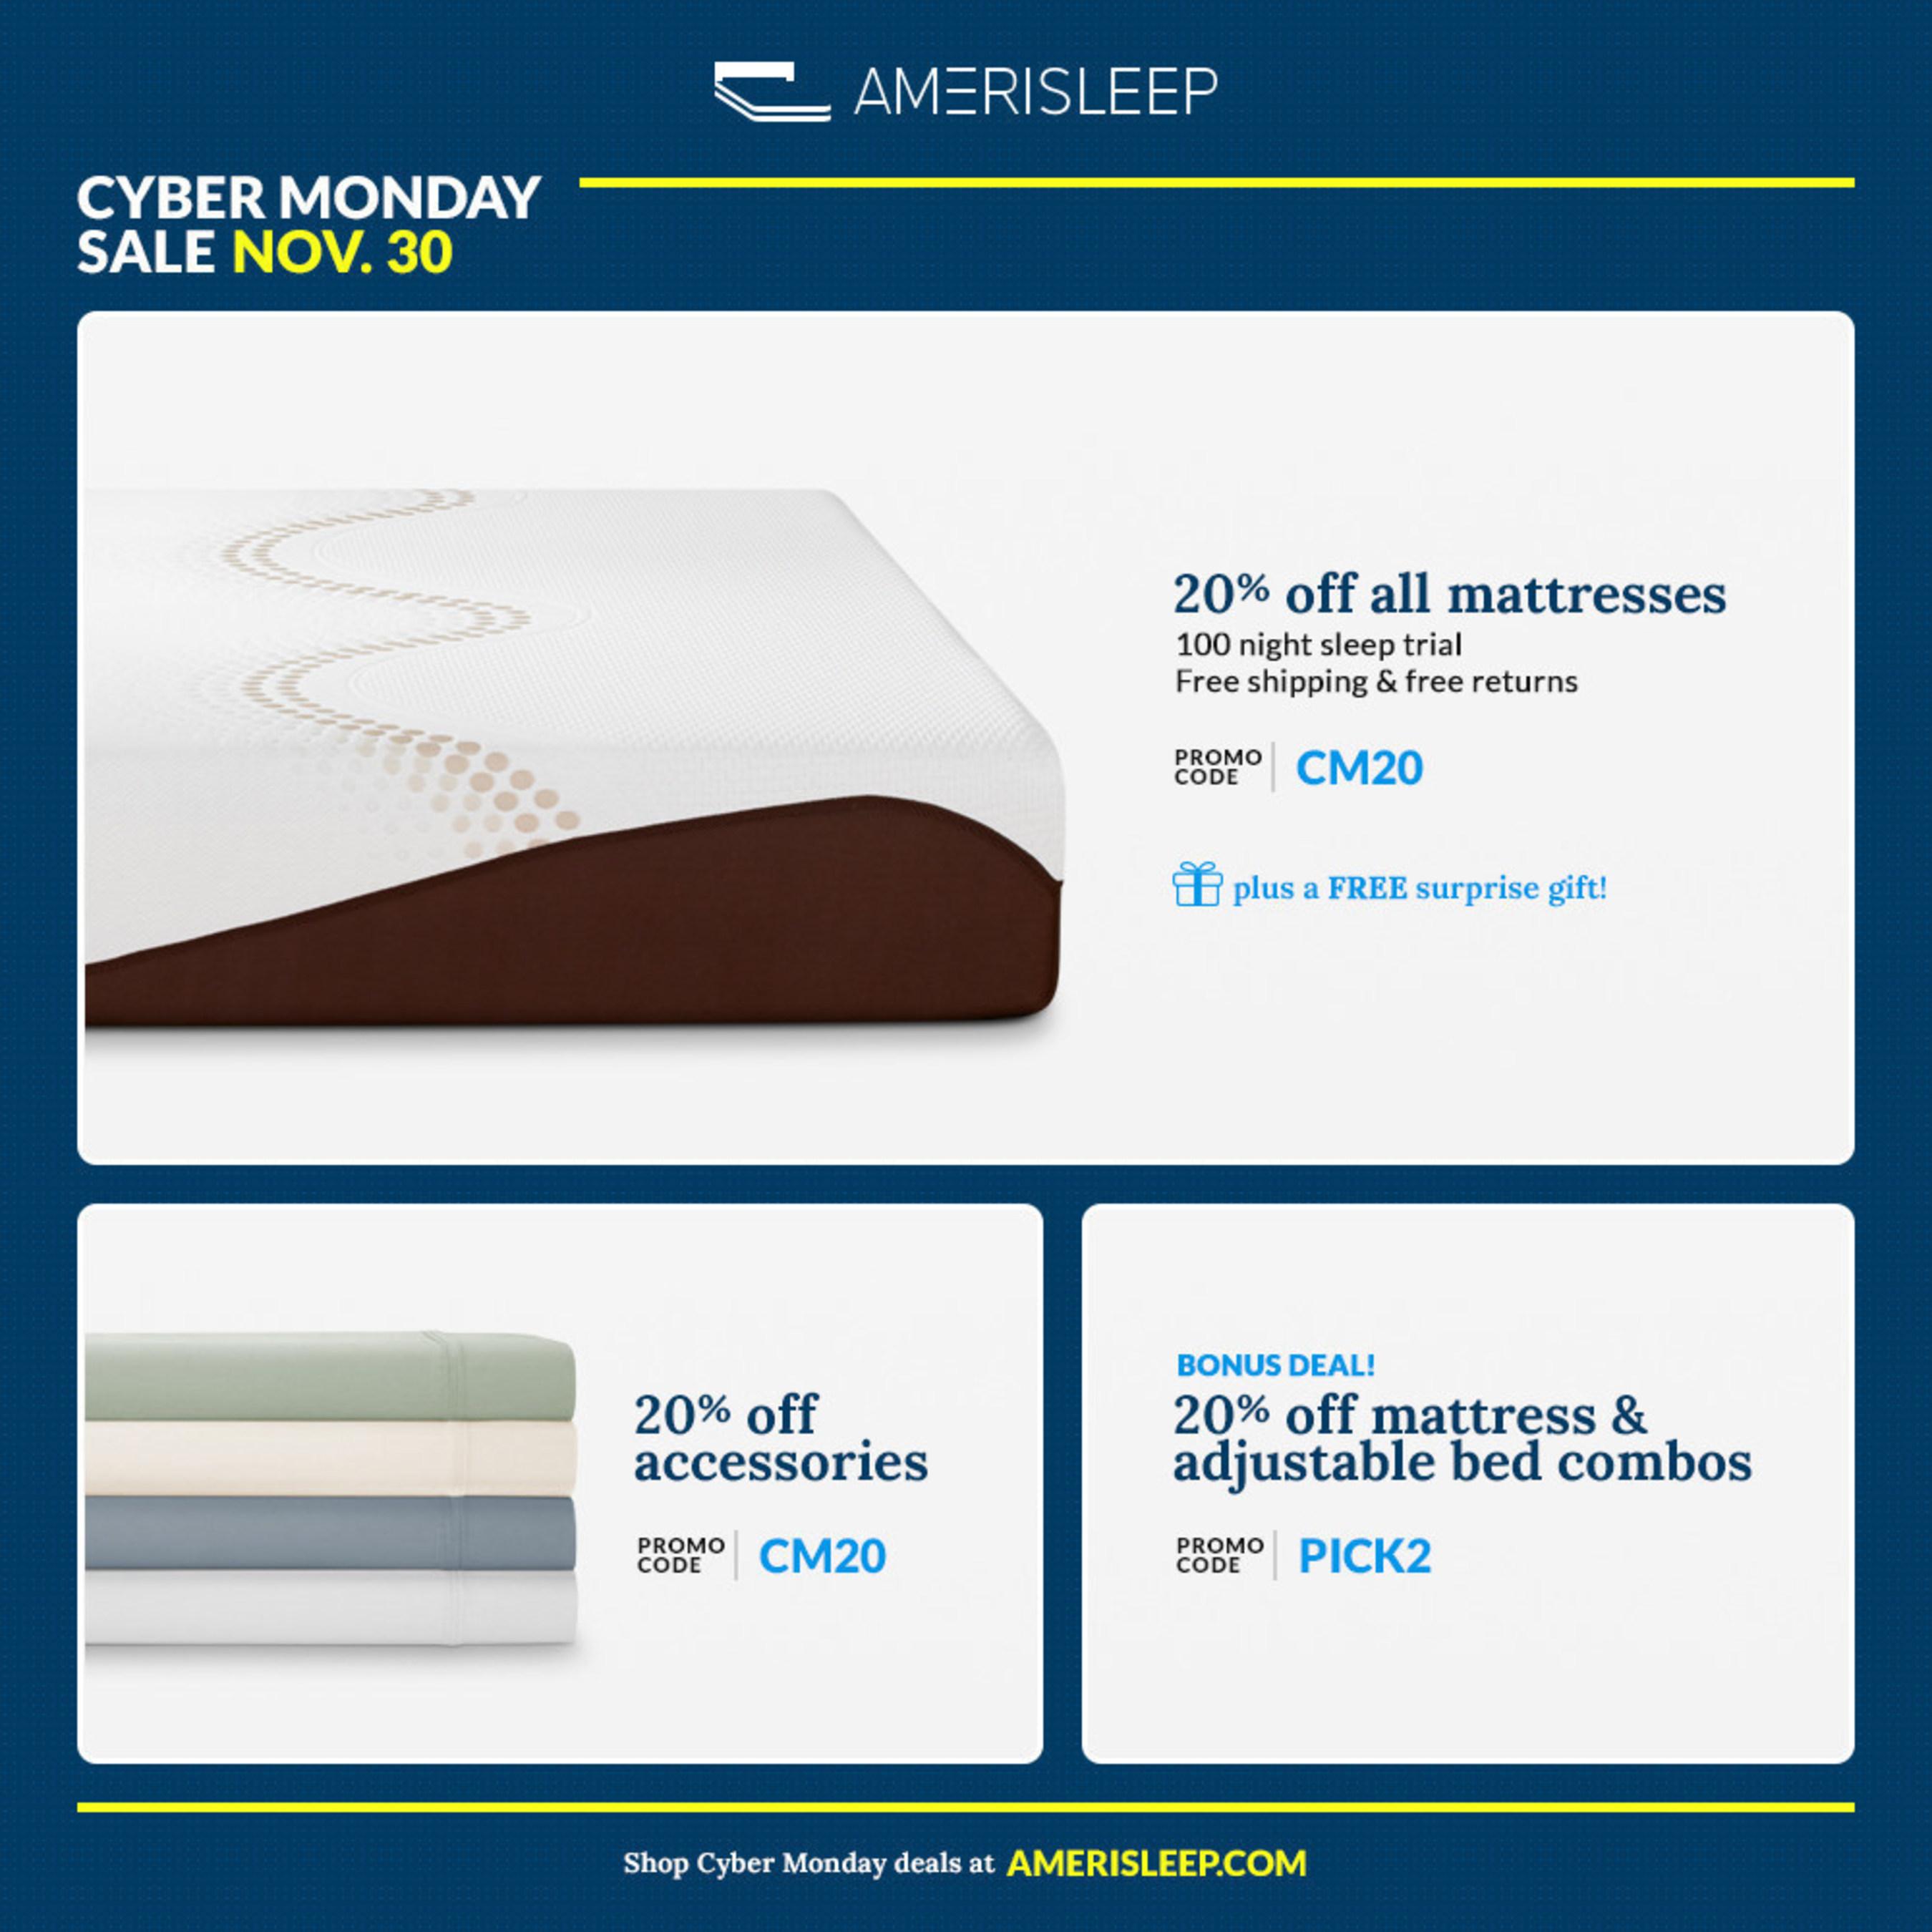 Amerisleep's 2015 Cyber Monday Mattress Sale on Memory Foam Announced